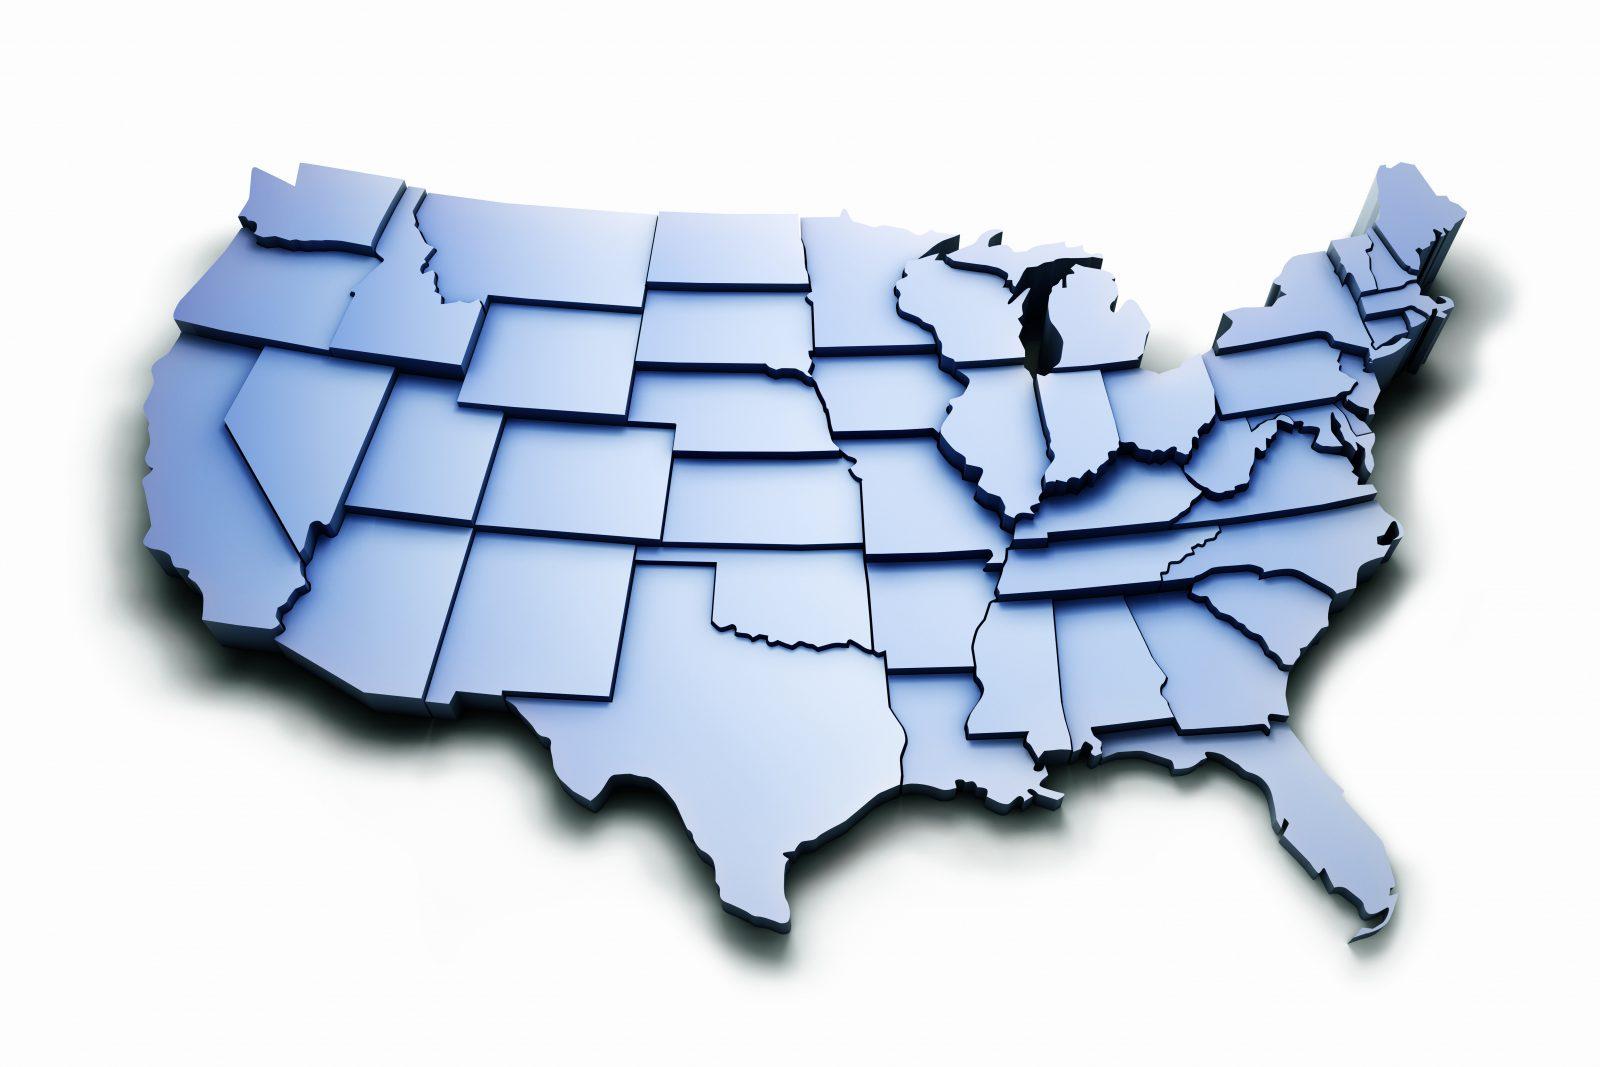 Recent Trends In Waterborne Disease Outbreaks In The Us